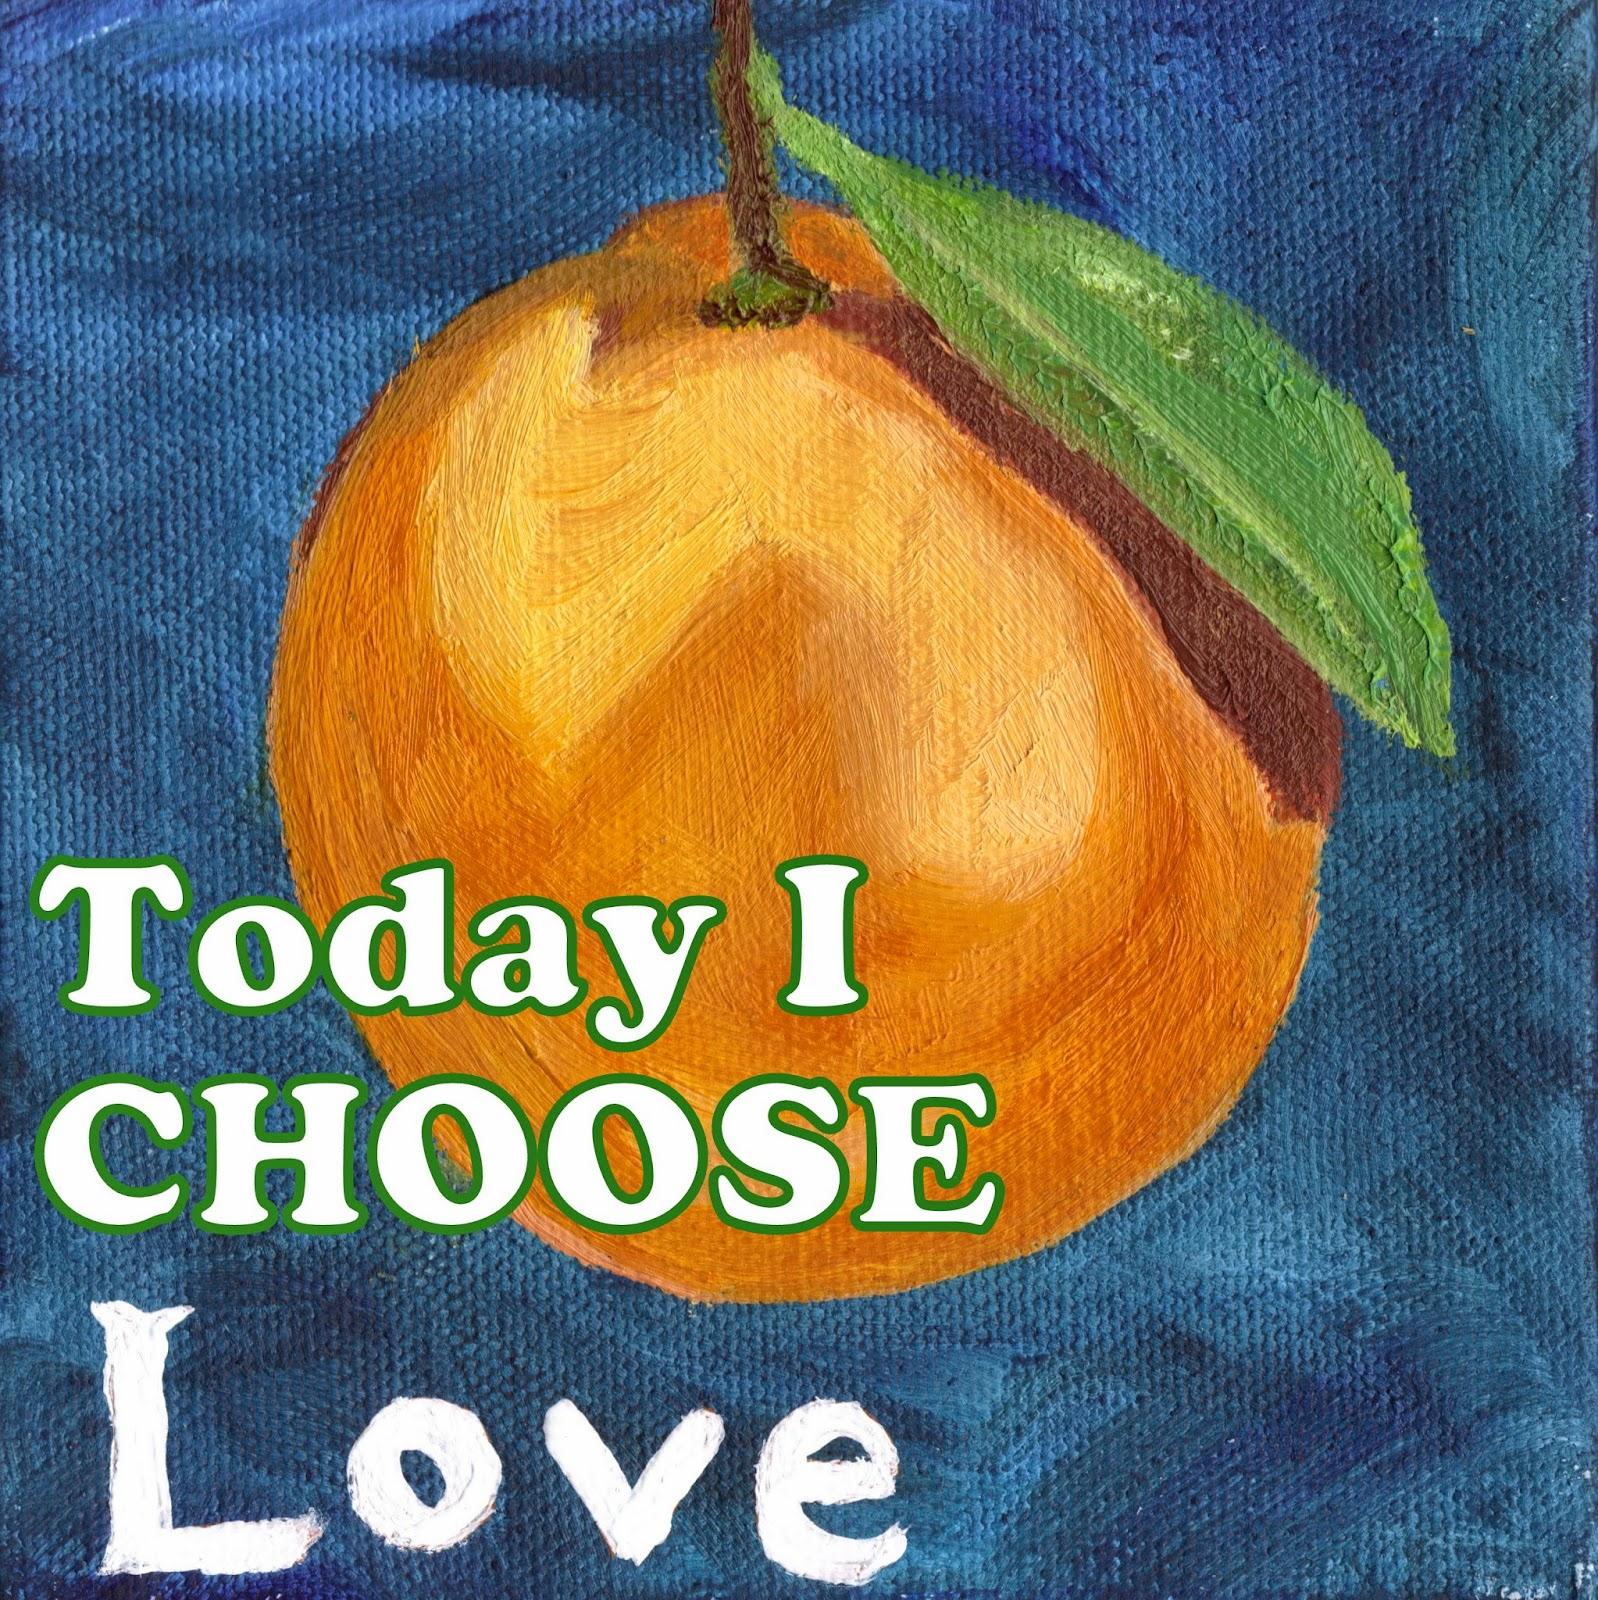 http://fineartamerica.com/featured/love-amber-joy-eifler.html